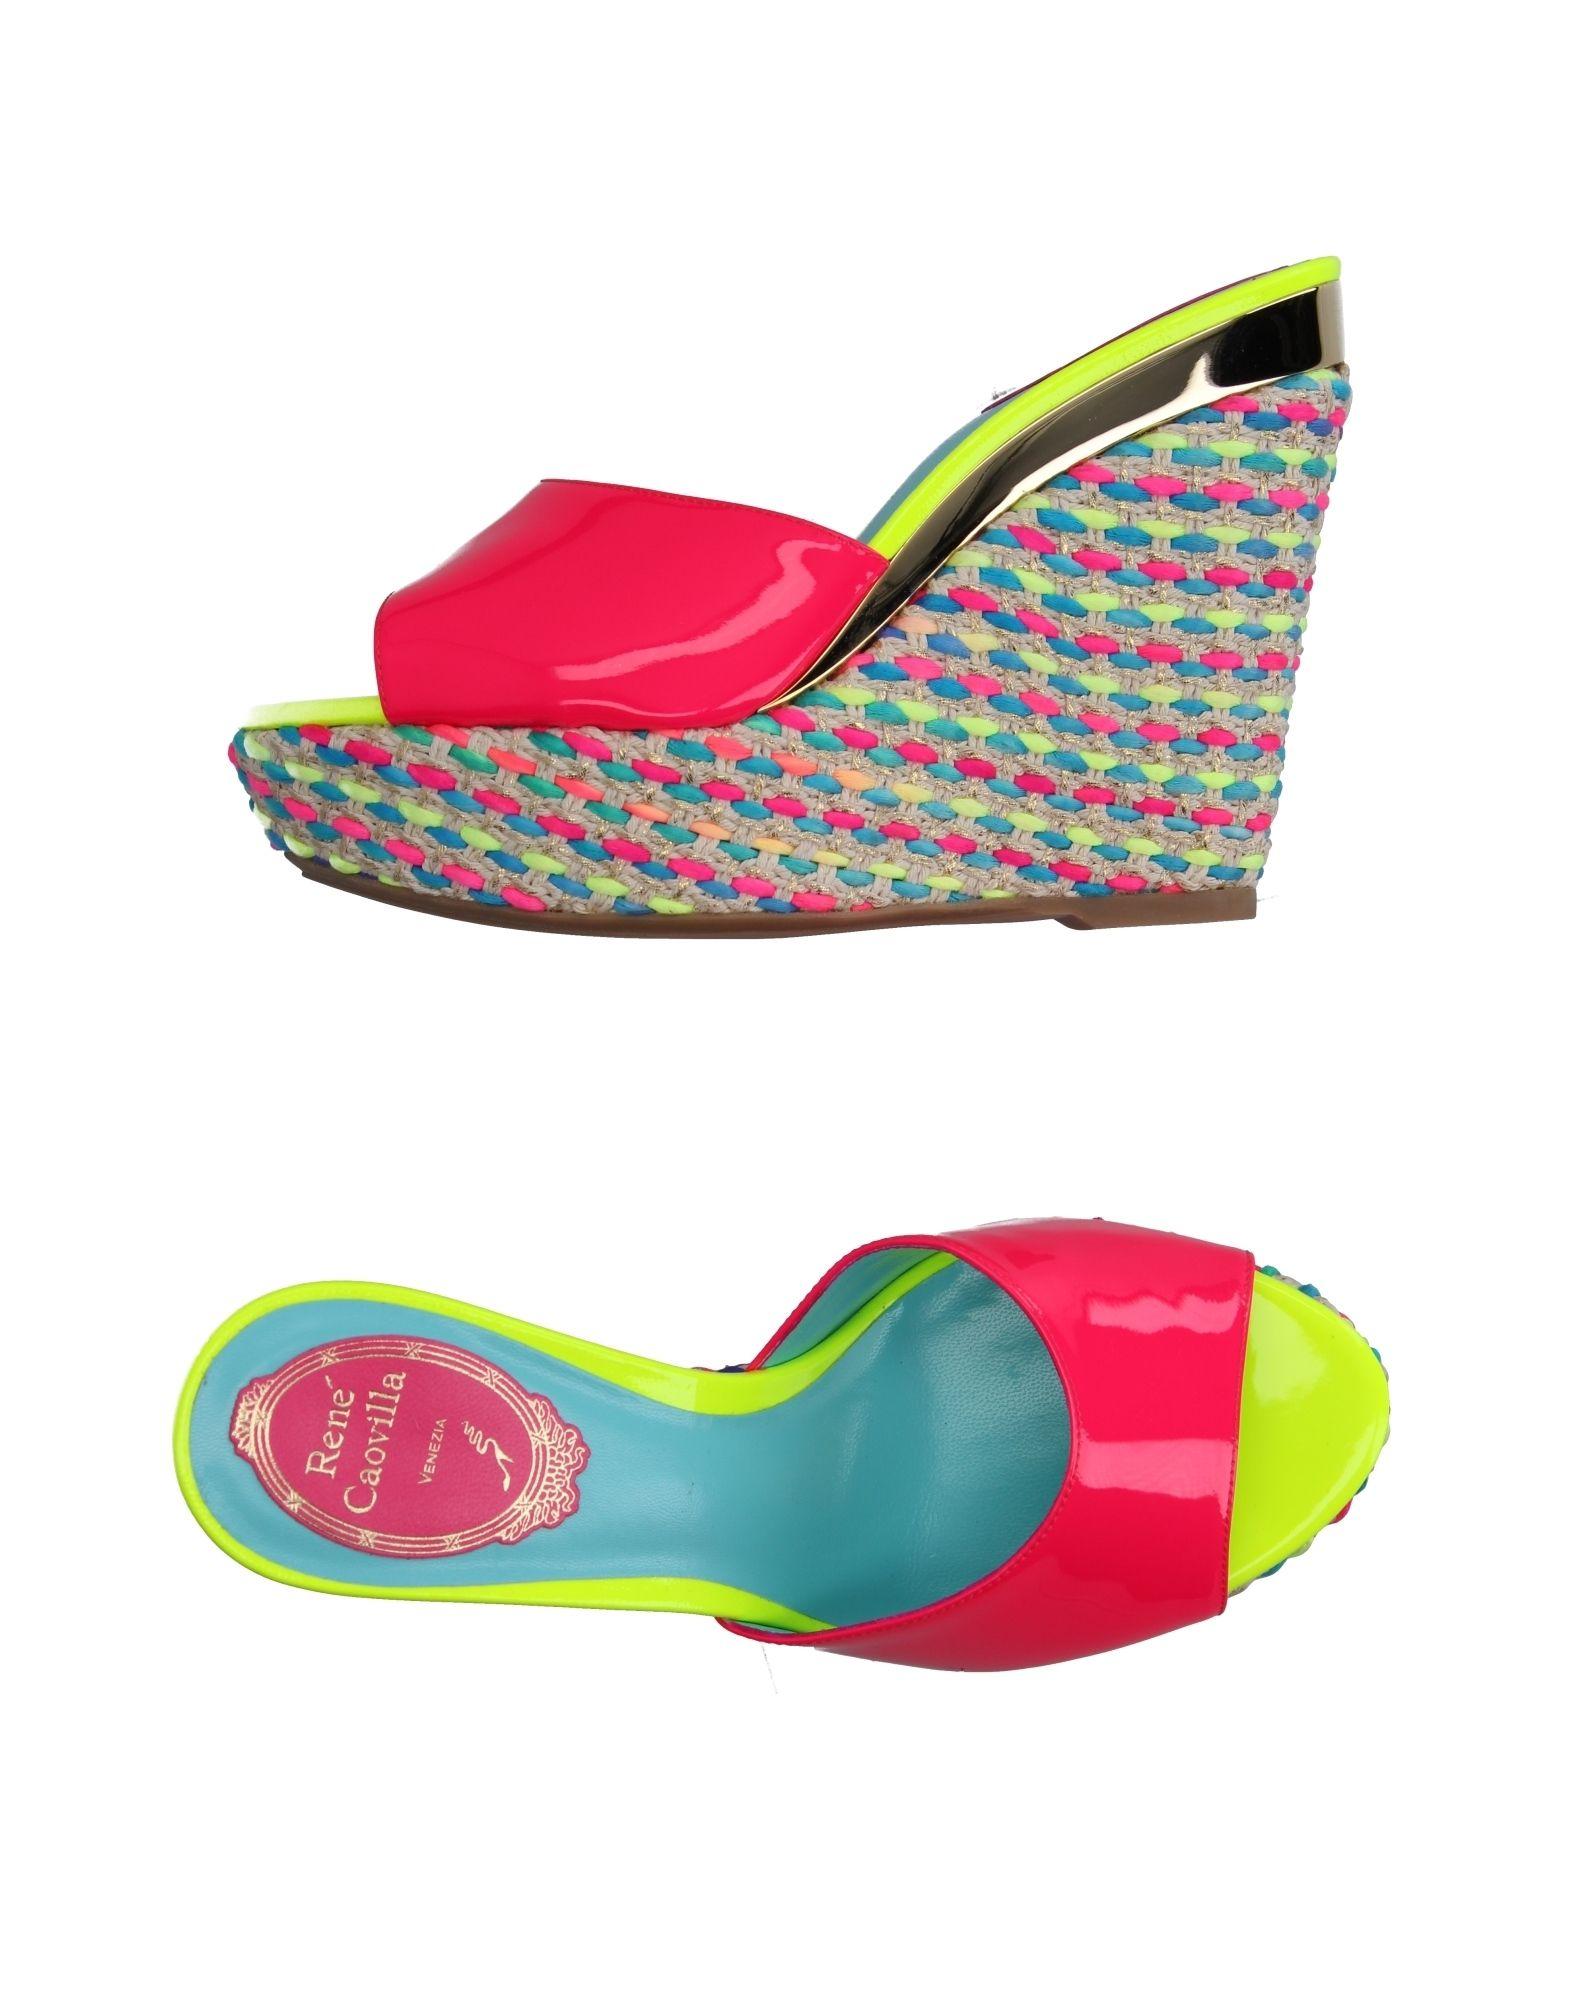 Sandali Rene' Rene' Caovilla donna - 11187121DS  Mode-Einkaufszentrum